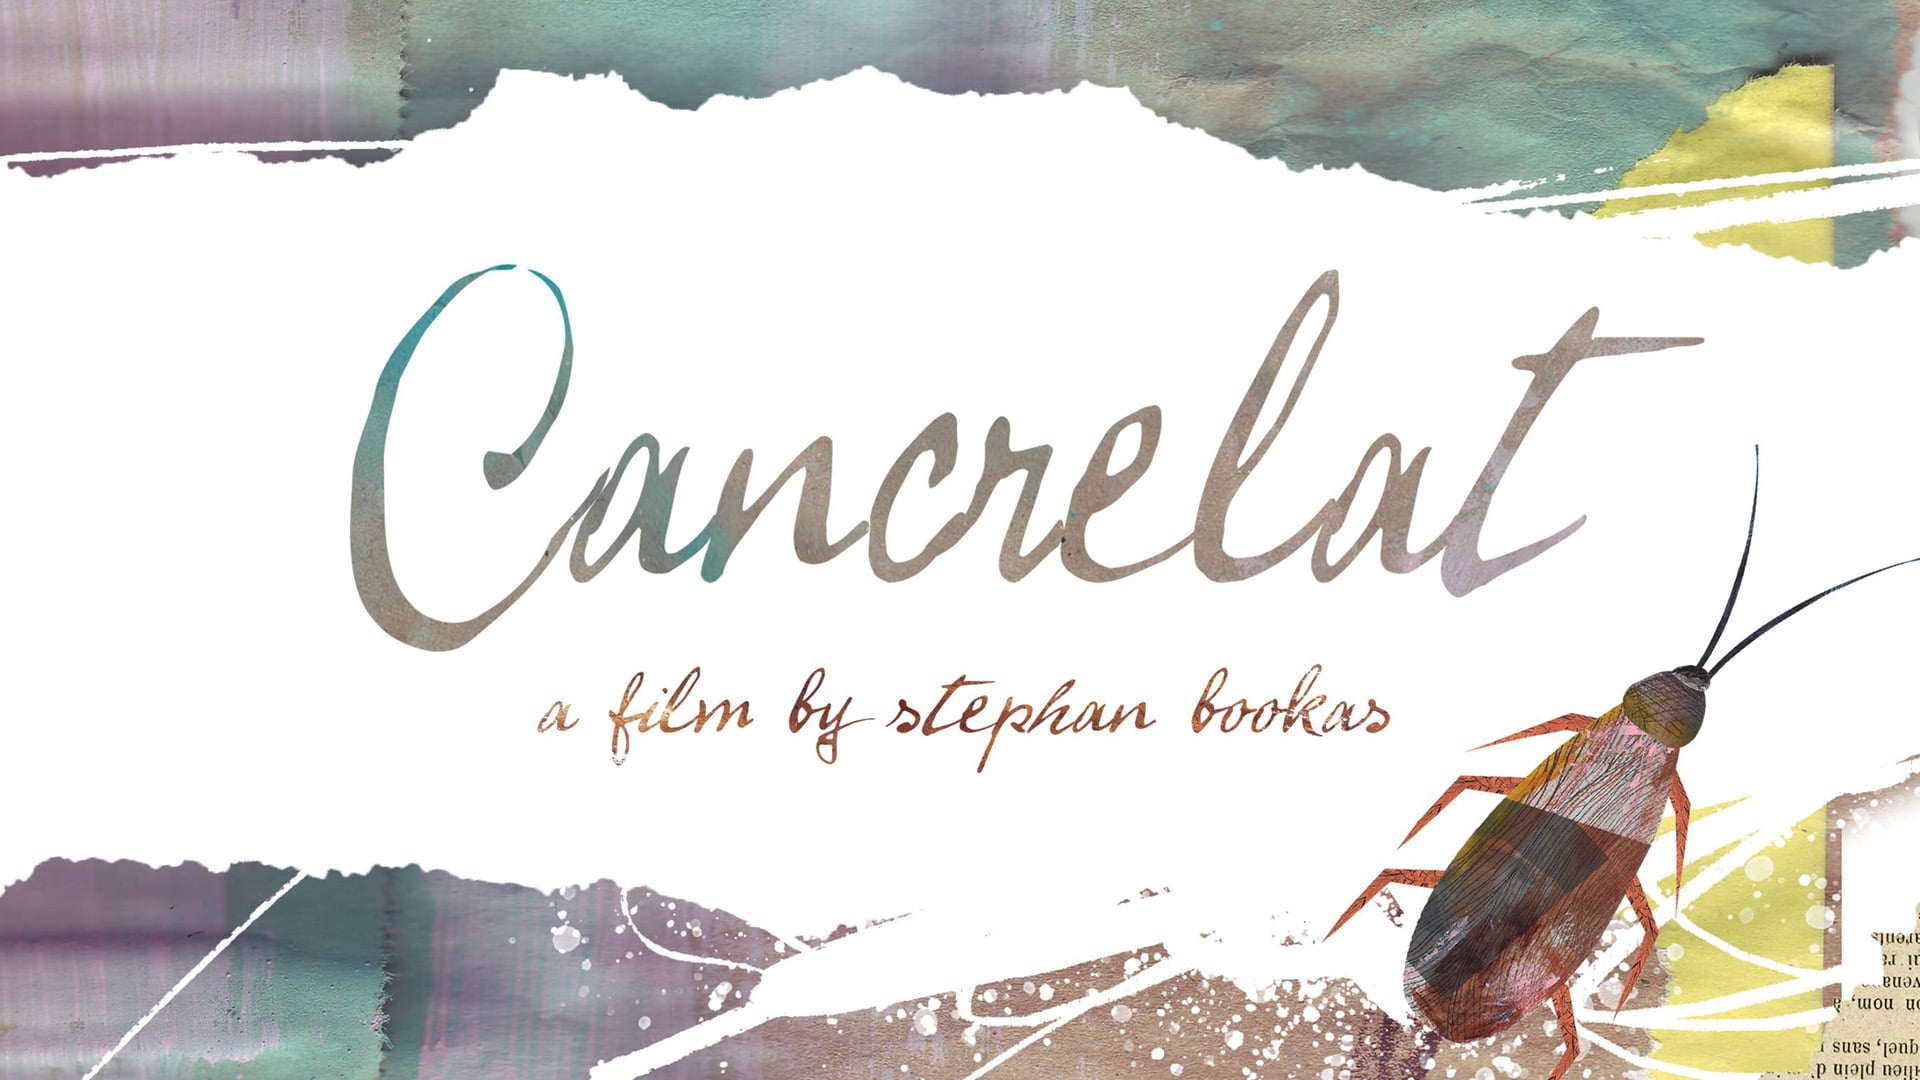 Cancrelat - Trailer